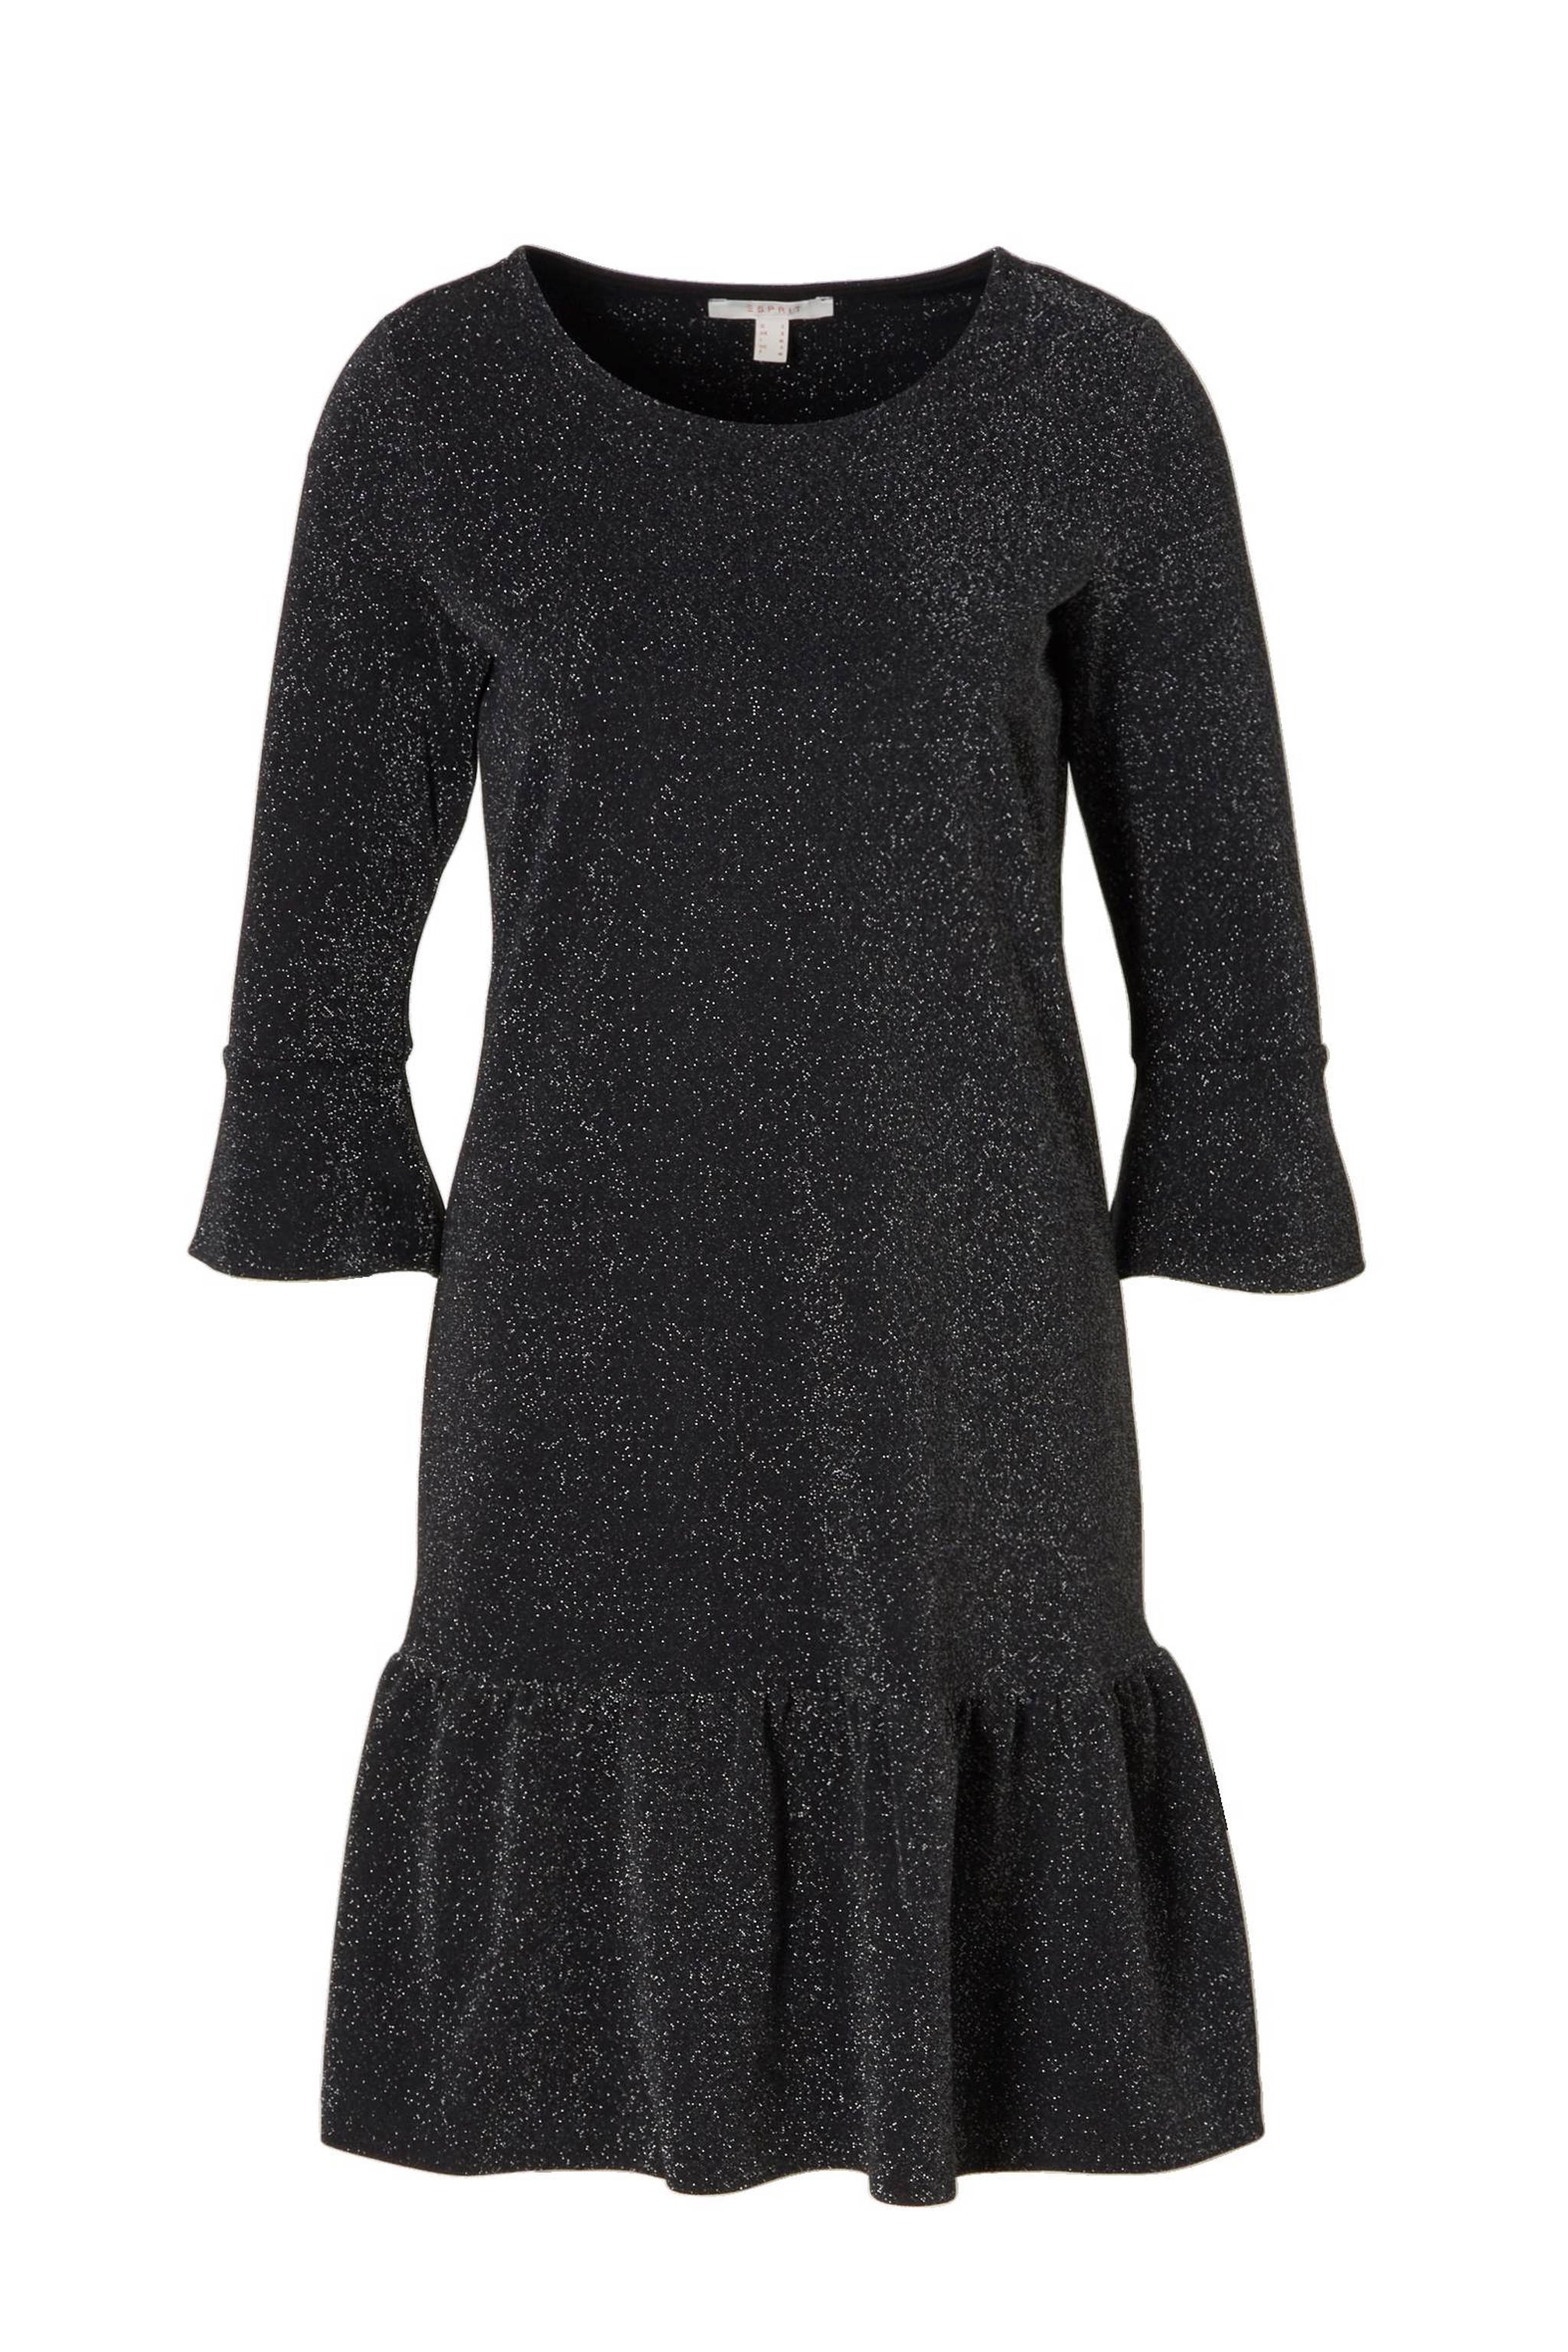 ab354162d0fae1 ESPRIT Women Casual glitter jurk met ruches